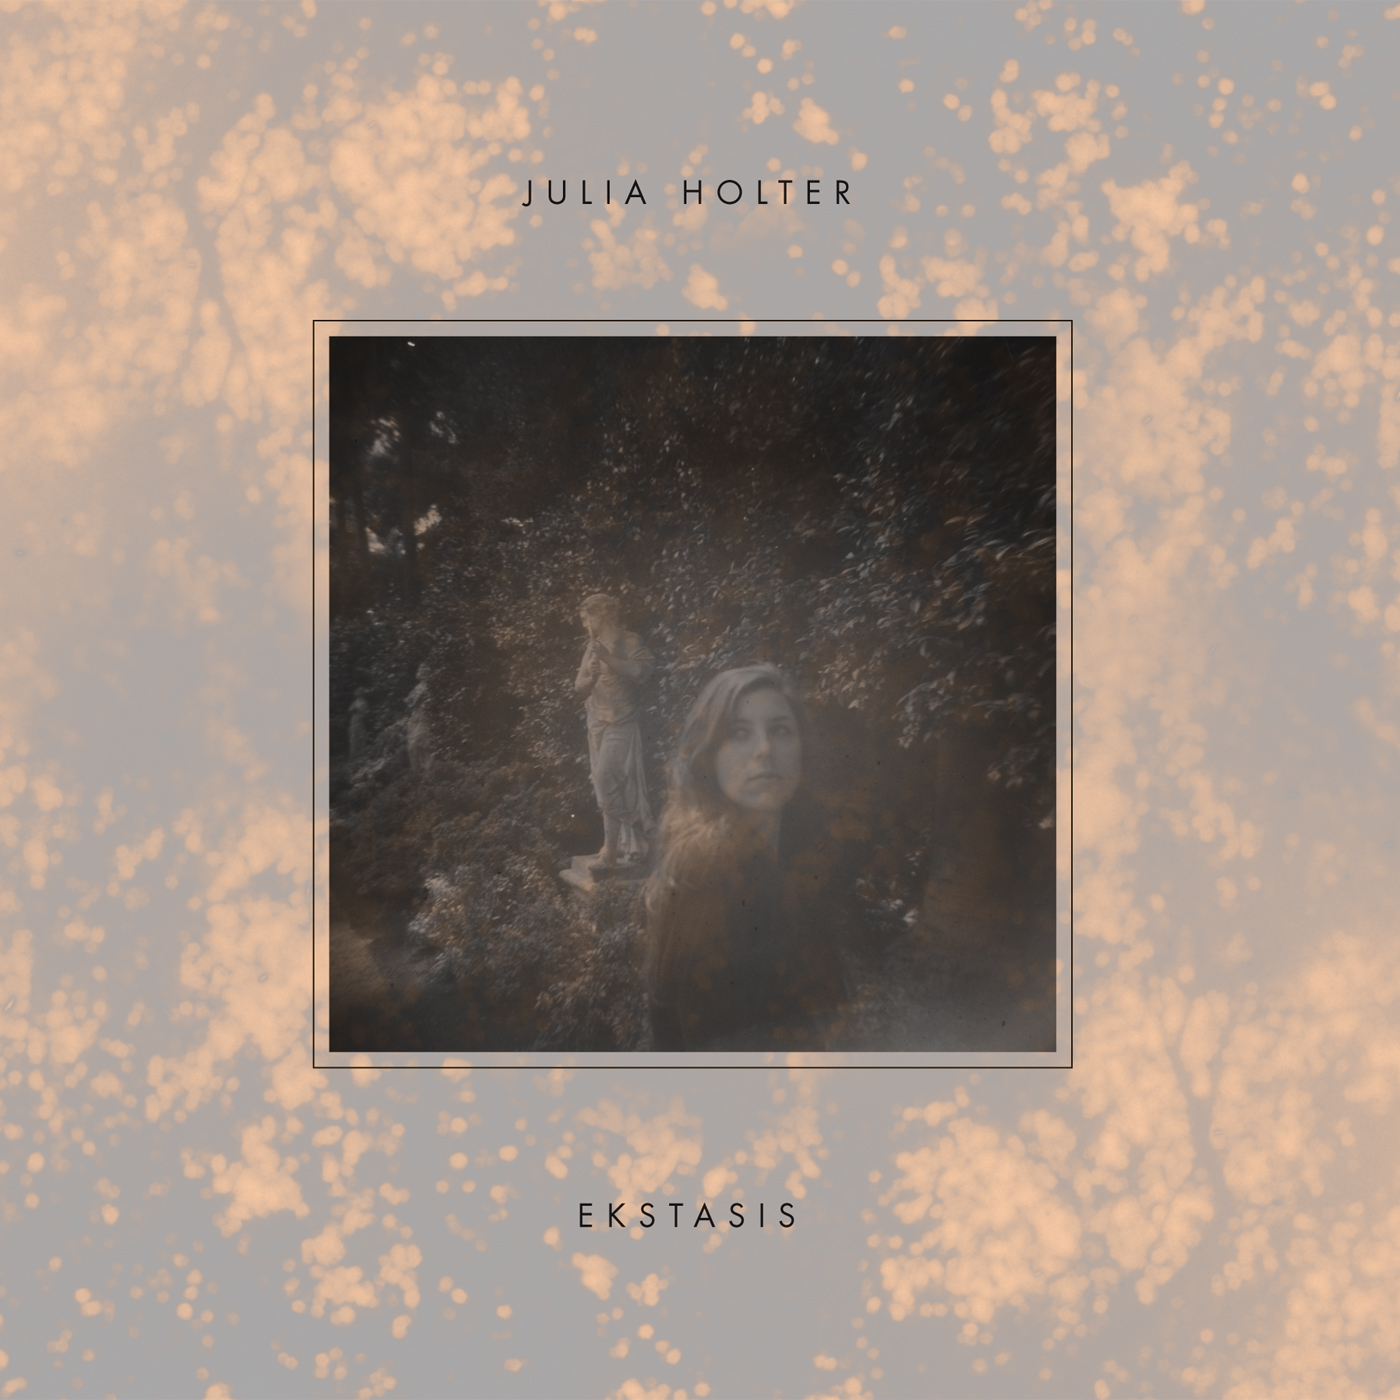 julia-holter-ekstasis-cover